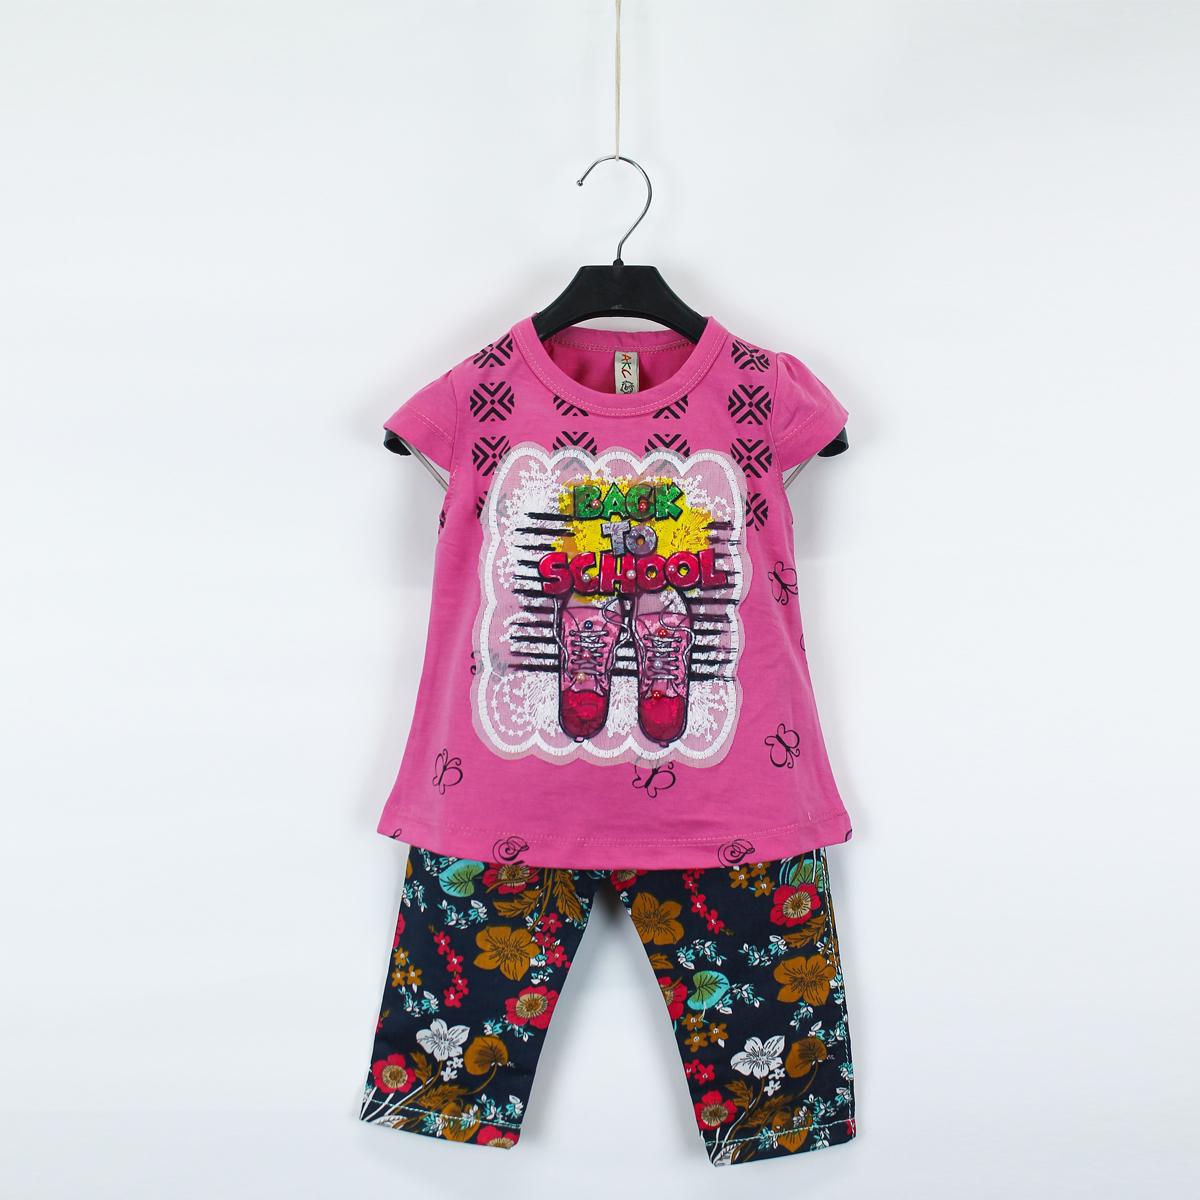 Cut Price Newborn Baby Suit 3 Mth - 9 Mth Net Embroidery SCH